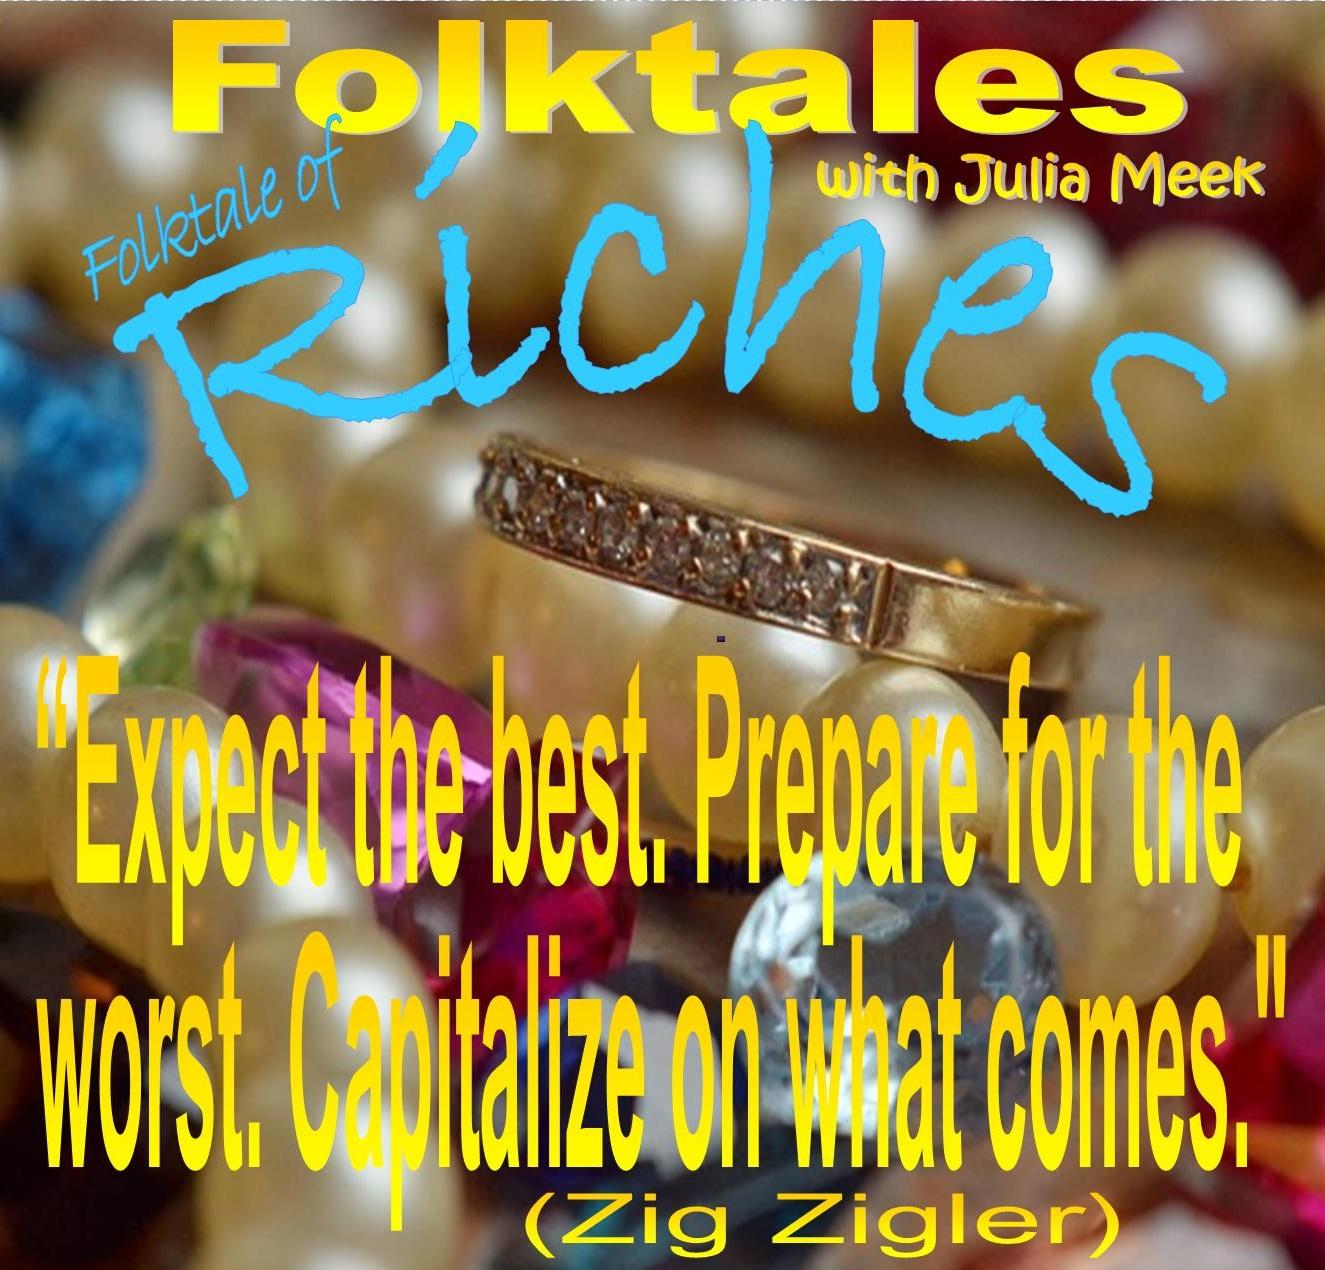 Caption: WBOI's Folktale of Riches, Credit: Julia Meek